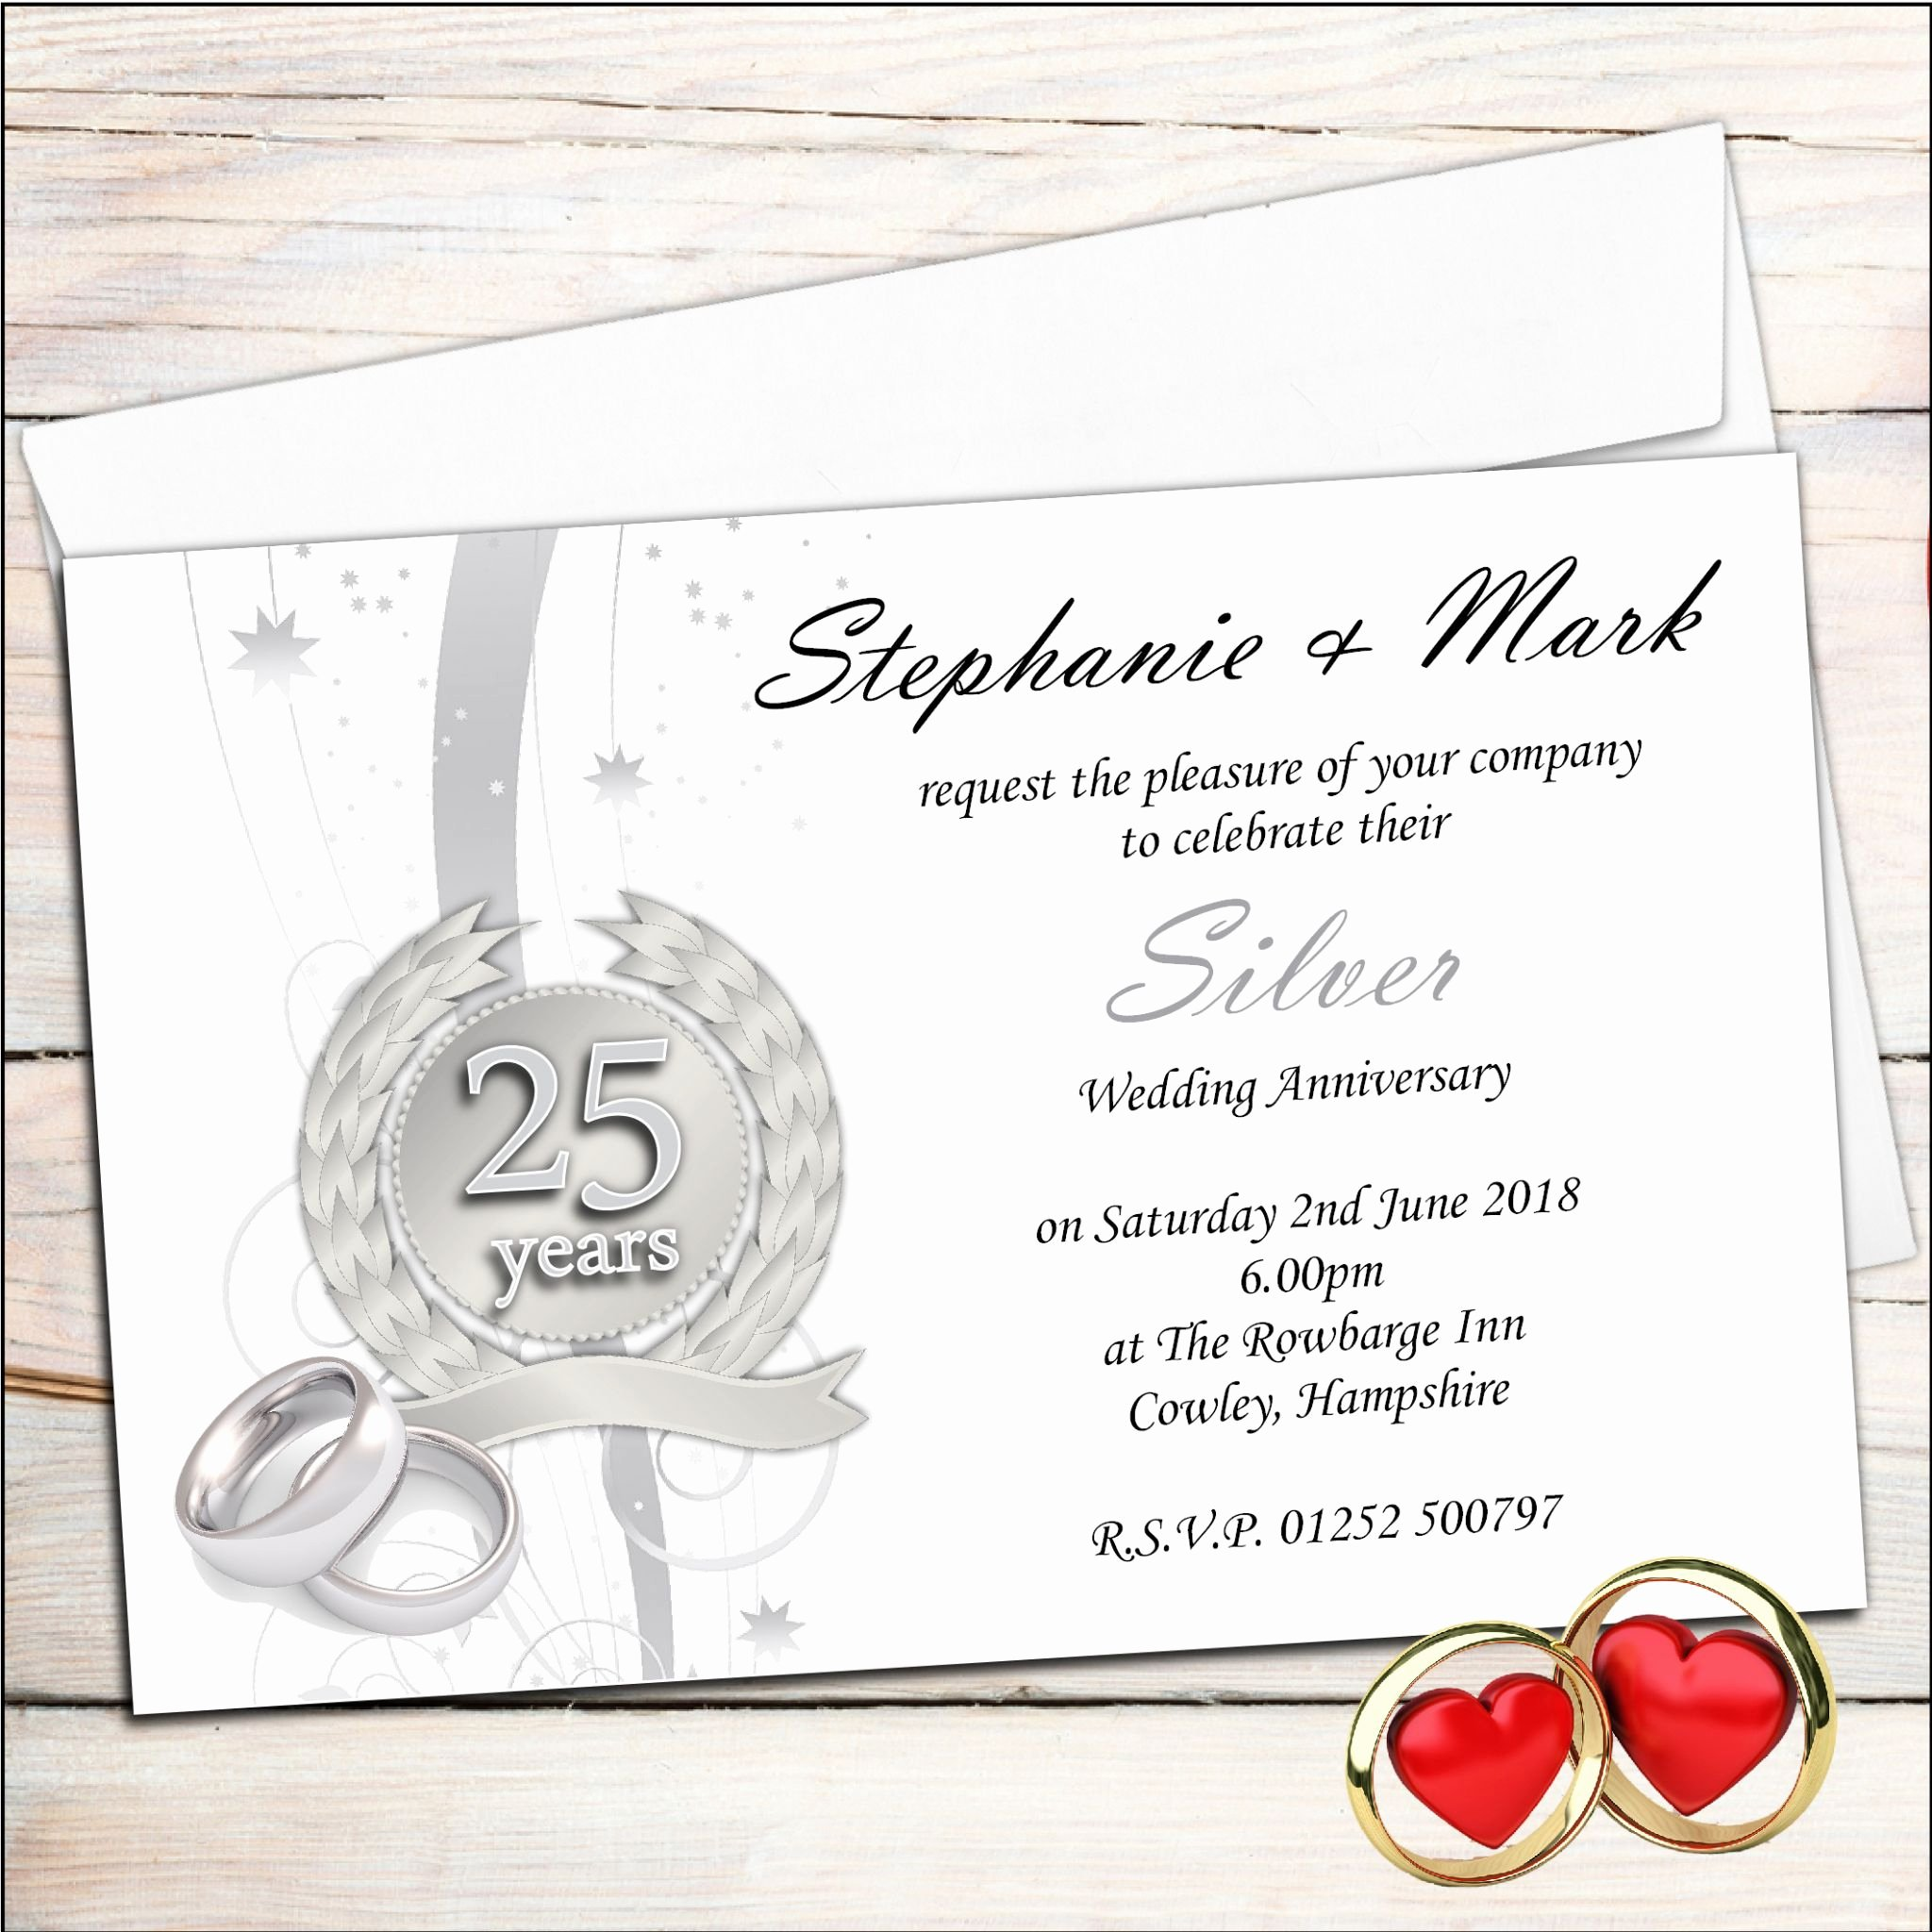 Wedding Anniversary Invitation Template New Anniversary Invitations 25th Silver Wedding Anniversary